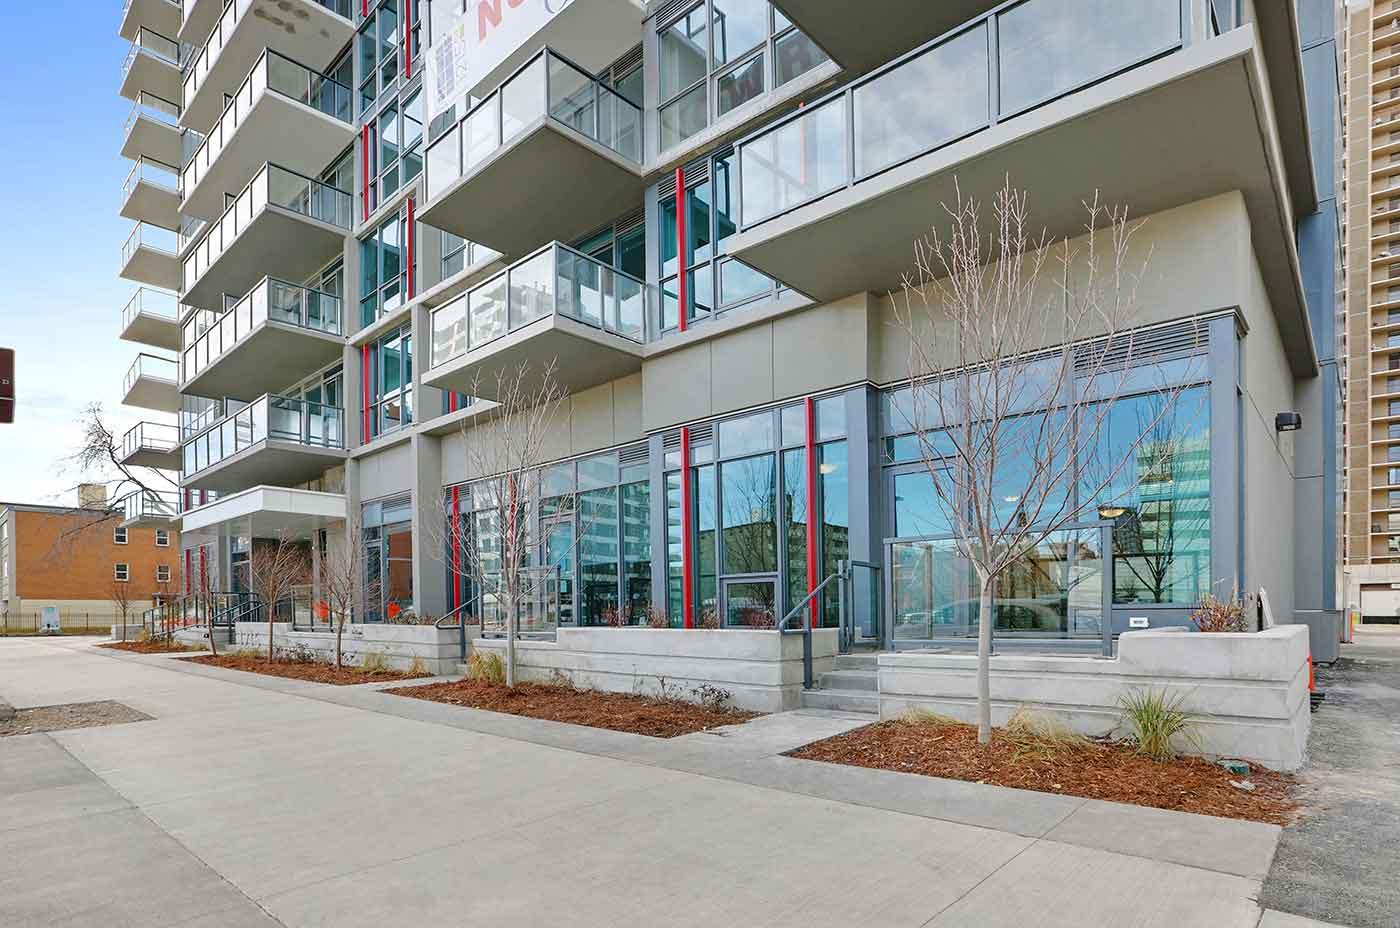 1215-apartments-calgary-exterior